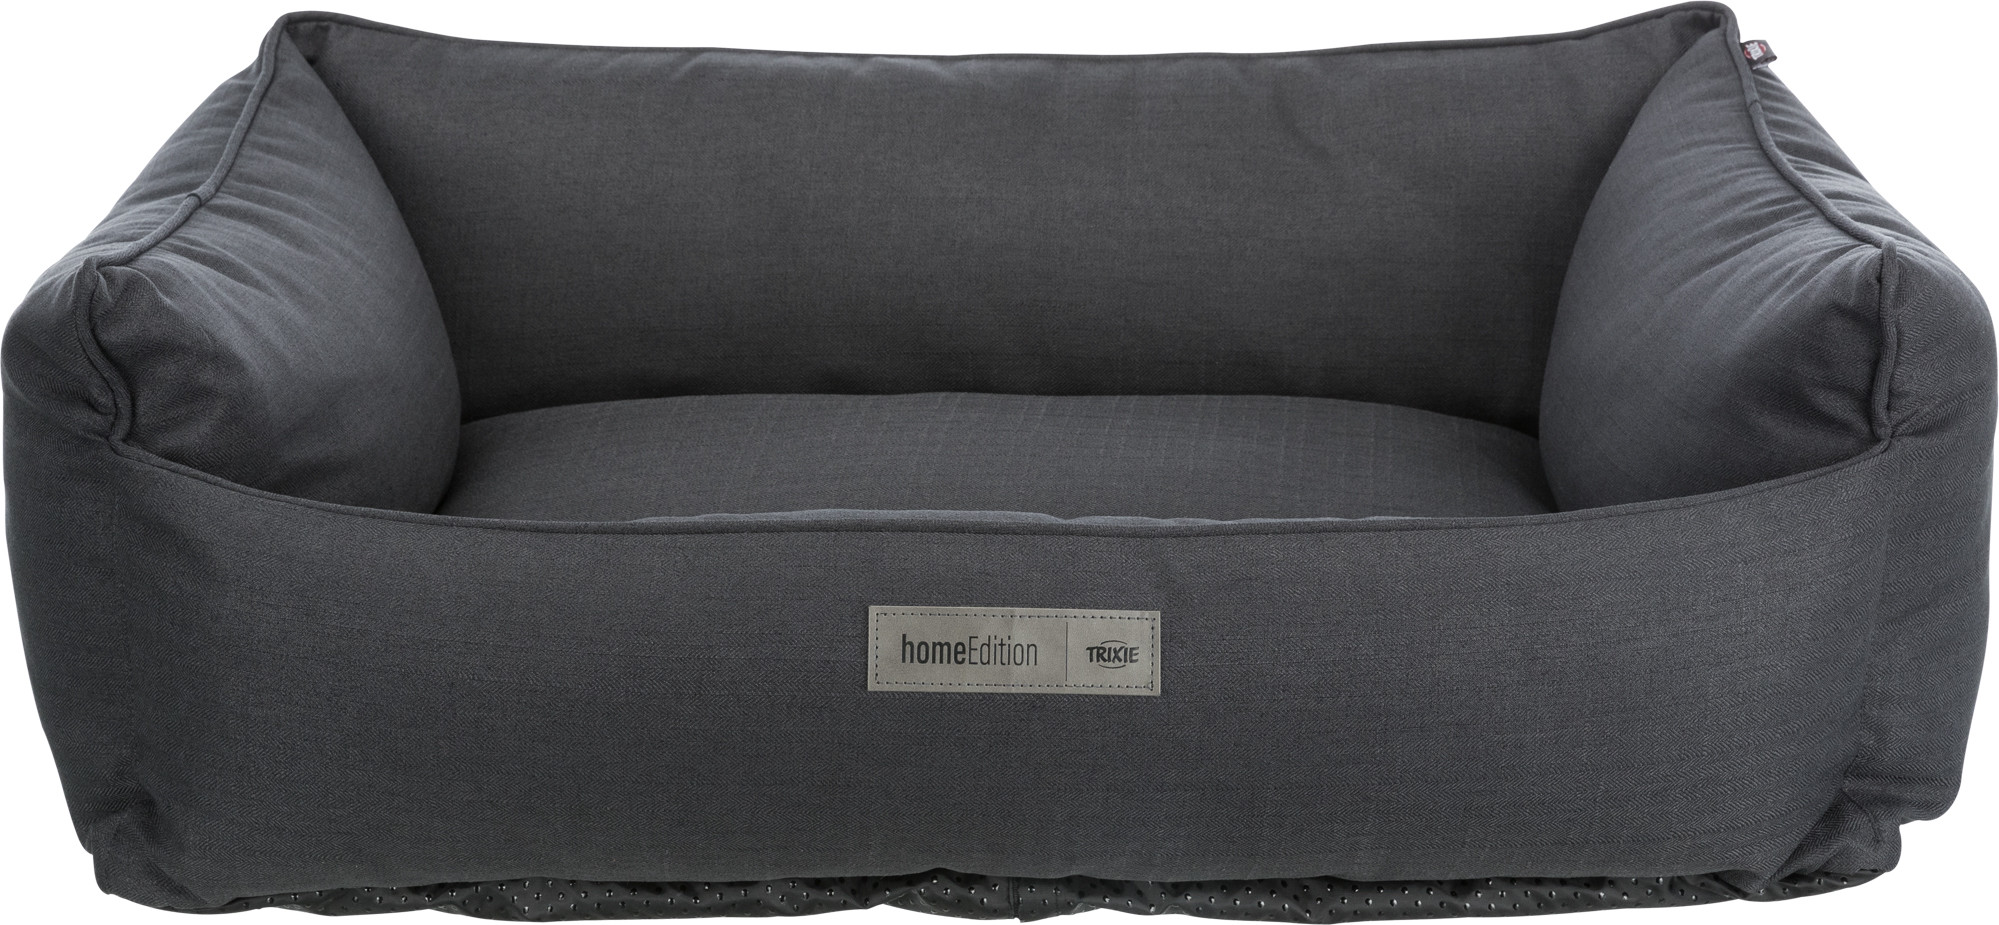 TRIXIE Bett Farello, eckig TRIXIE Bett Farello, eckig, 100 × 70 cm, schwarz